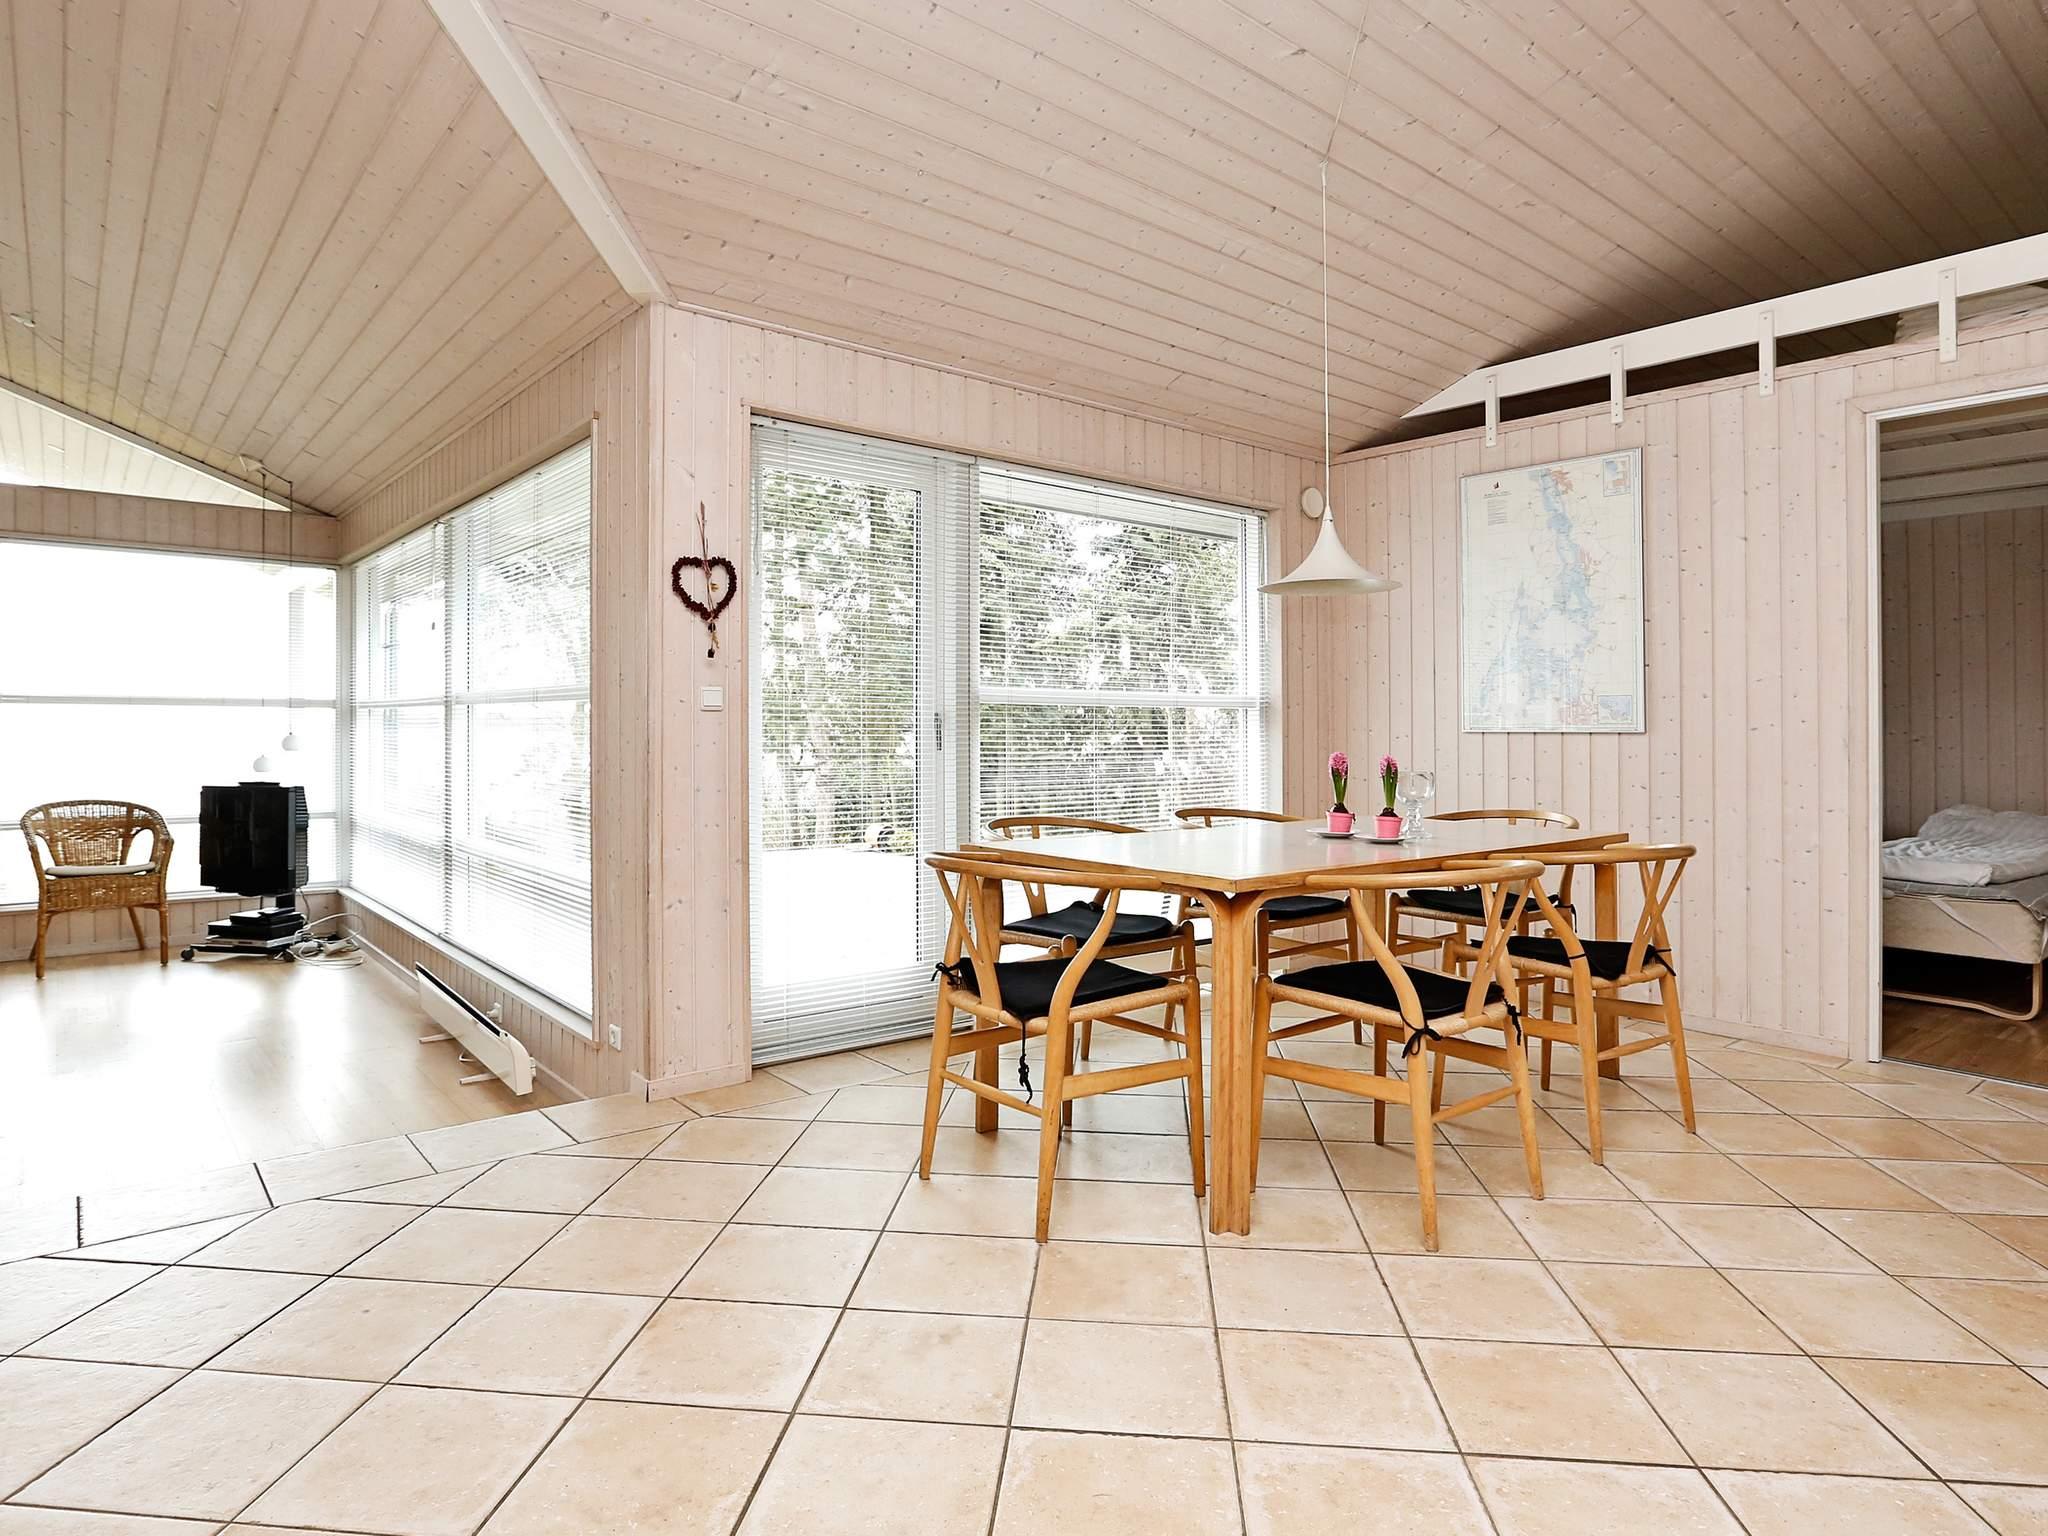 Maison de vacances Skibby (124927), Kirke Hyllinge, , Seeland Nord, Danemark, image 4